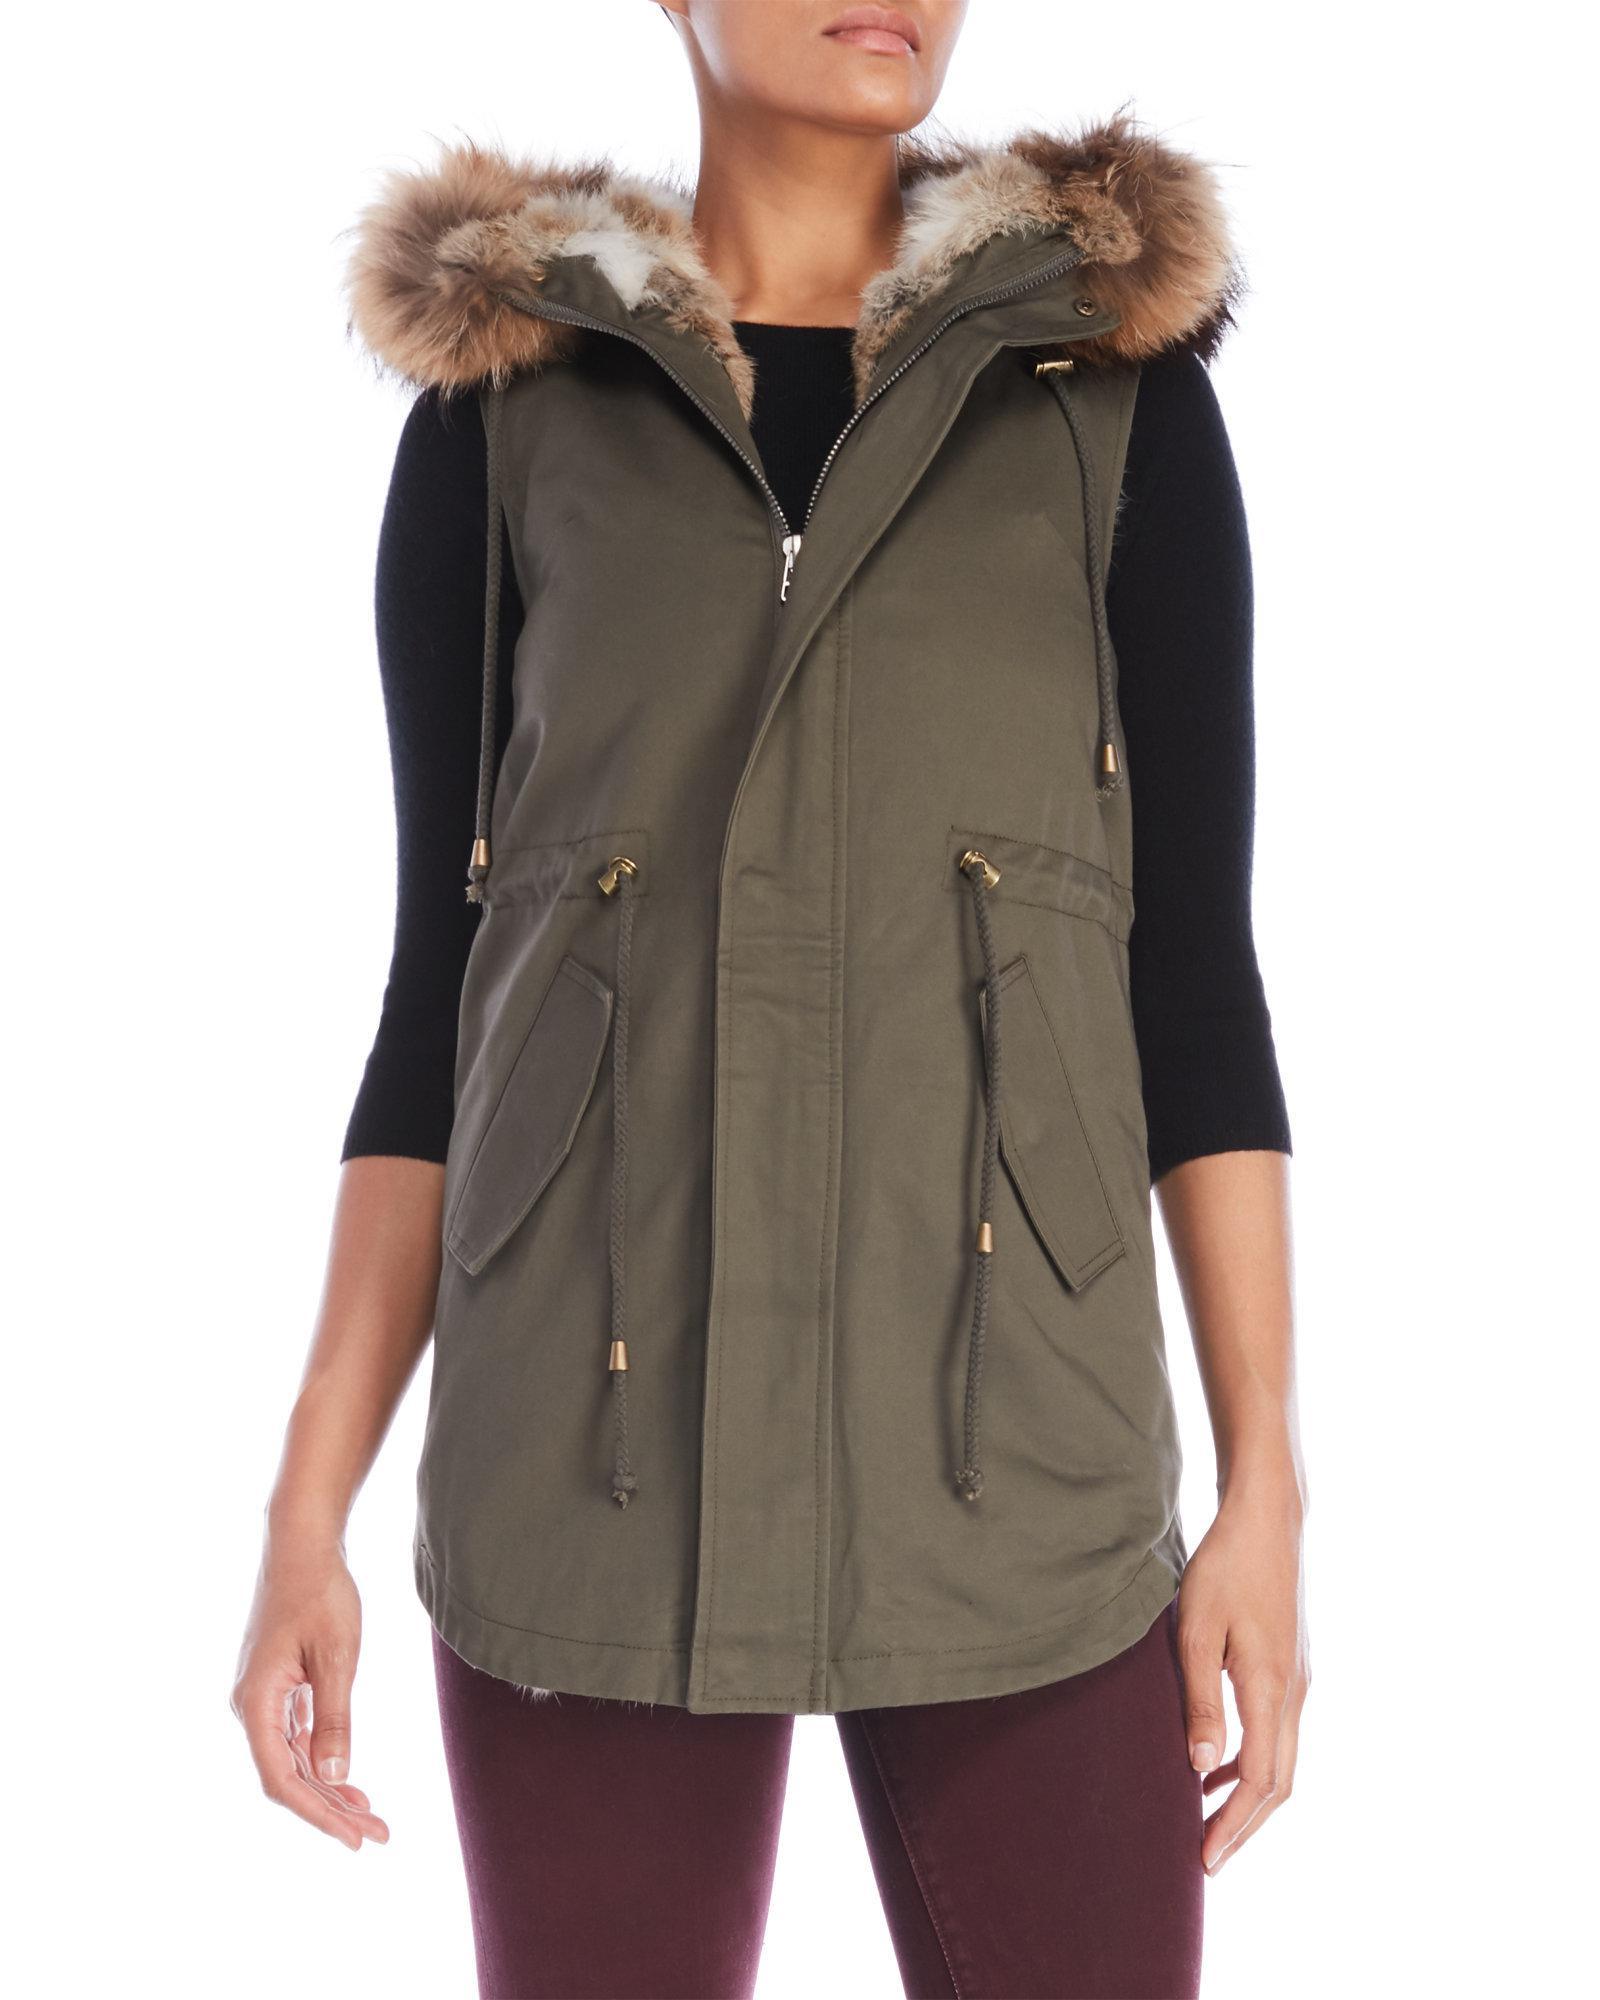 La fiorentina Real Fur-Trimmed Parka Vest in Green   Lyst